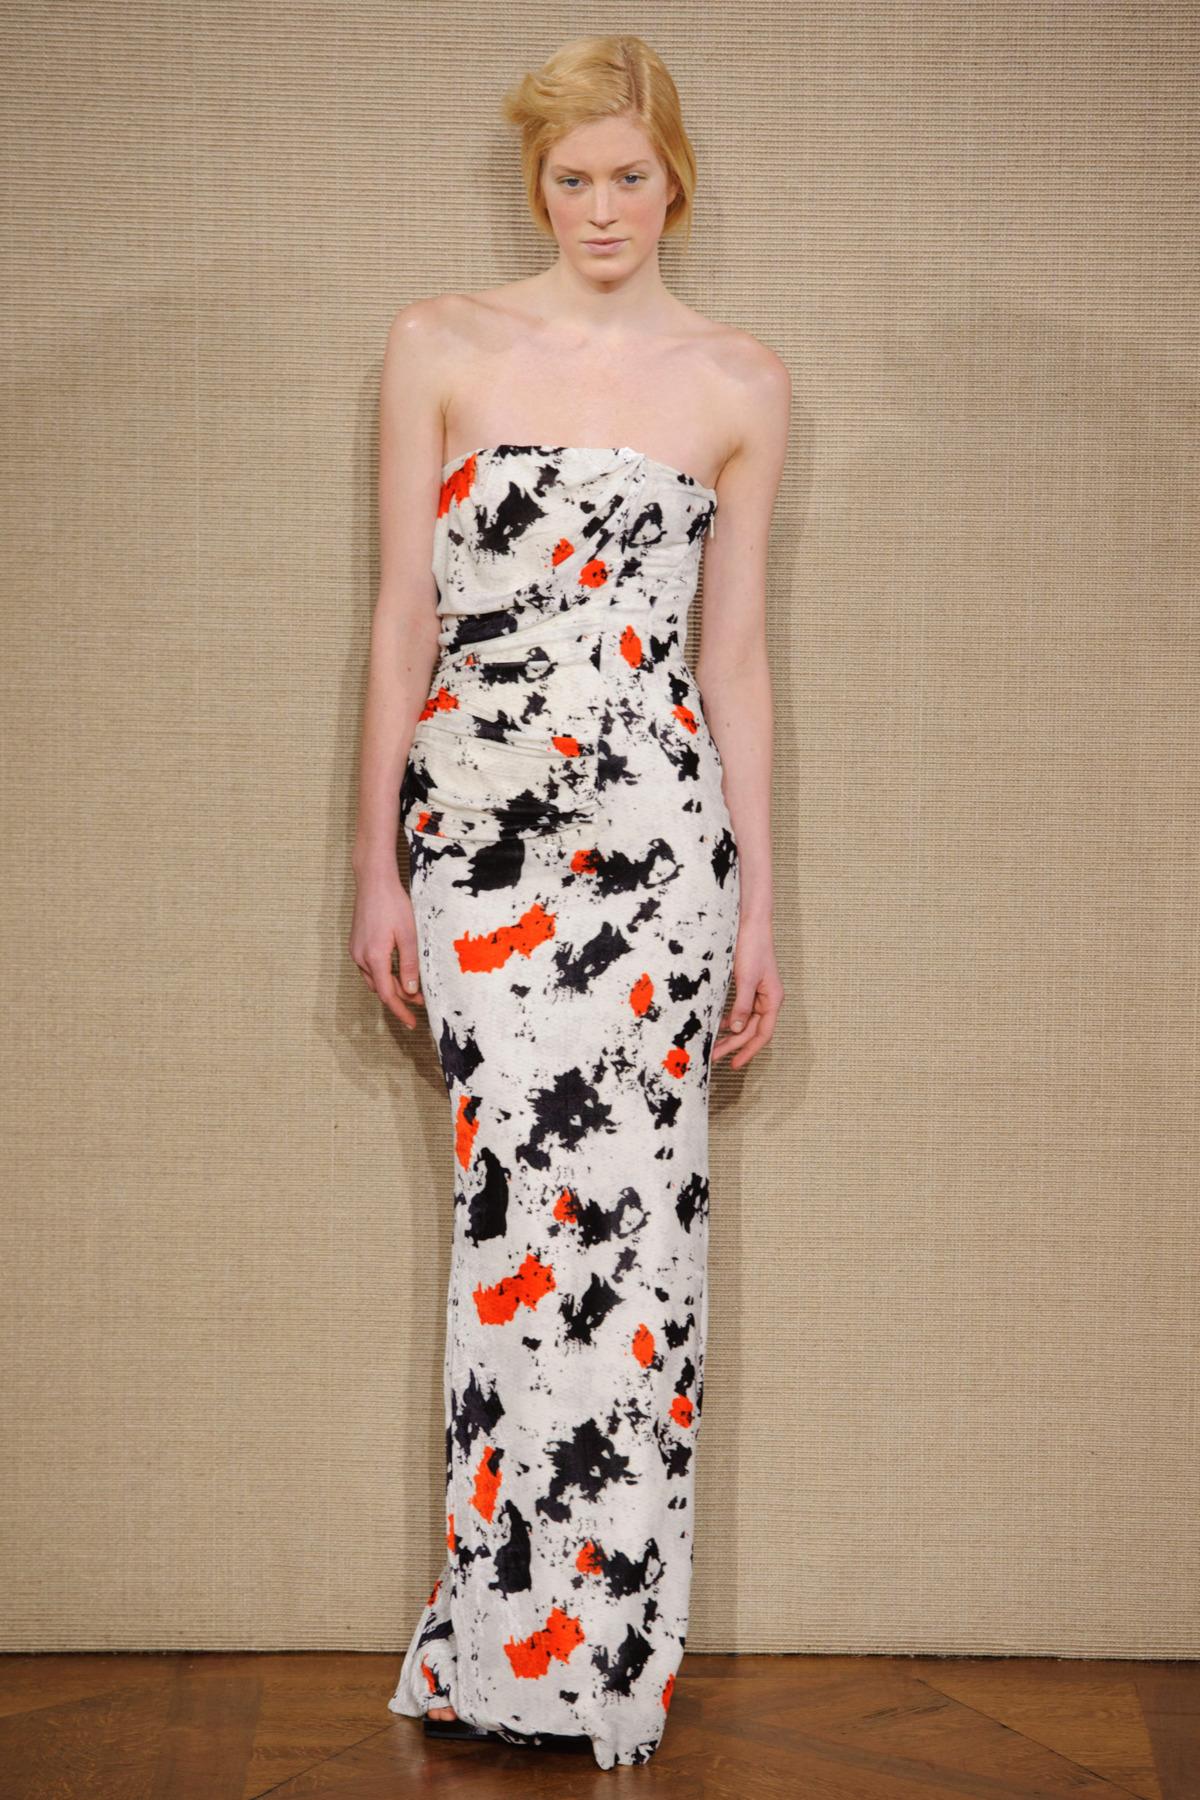 didit hediprasetyo couture - photo #45